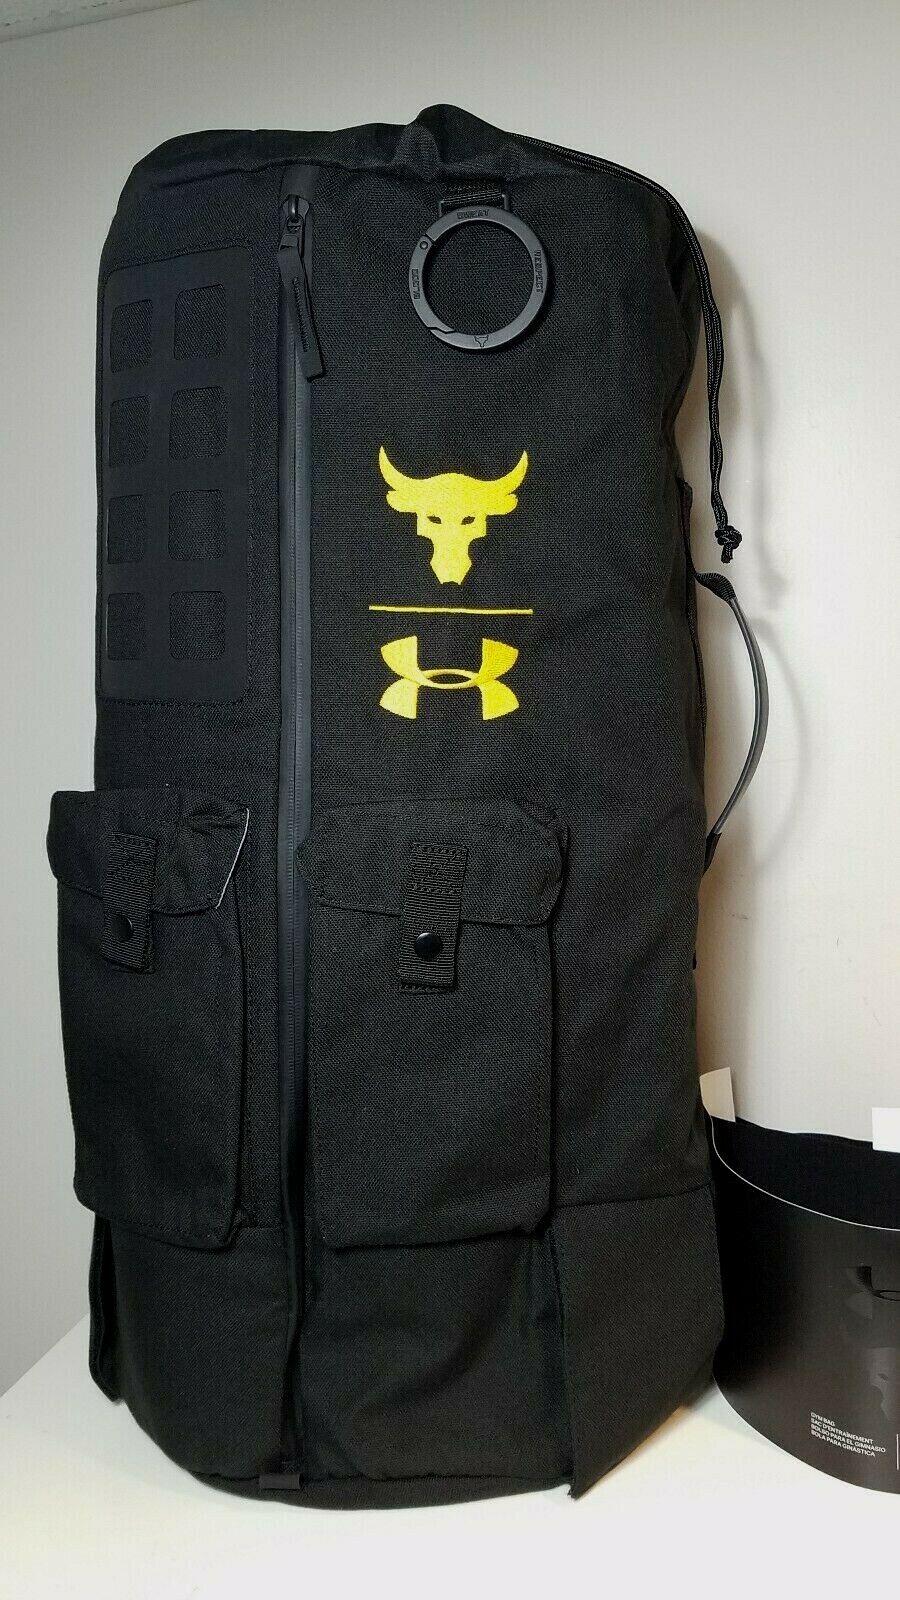 NWT Under Armour The Project Rock 90 Gym Duffle Big Bag UA B